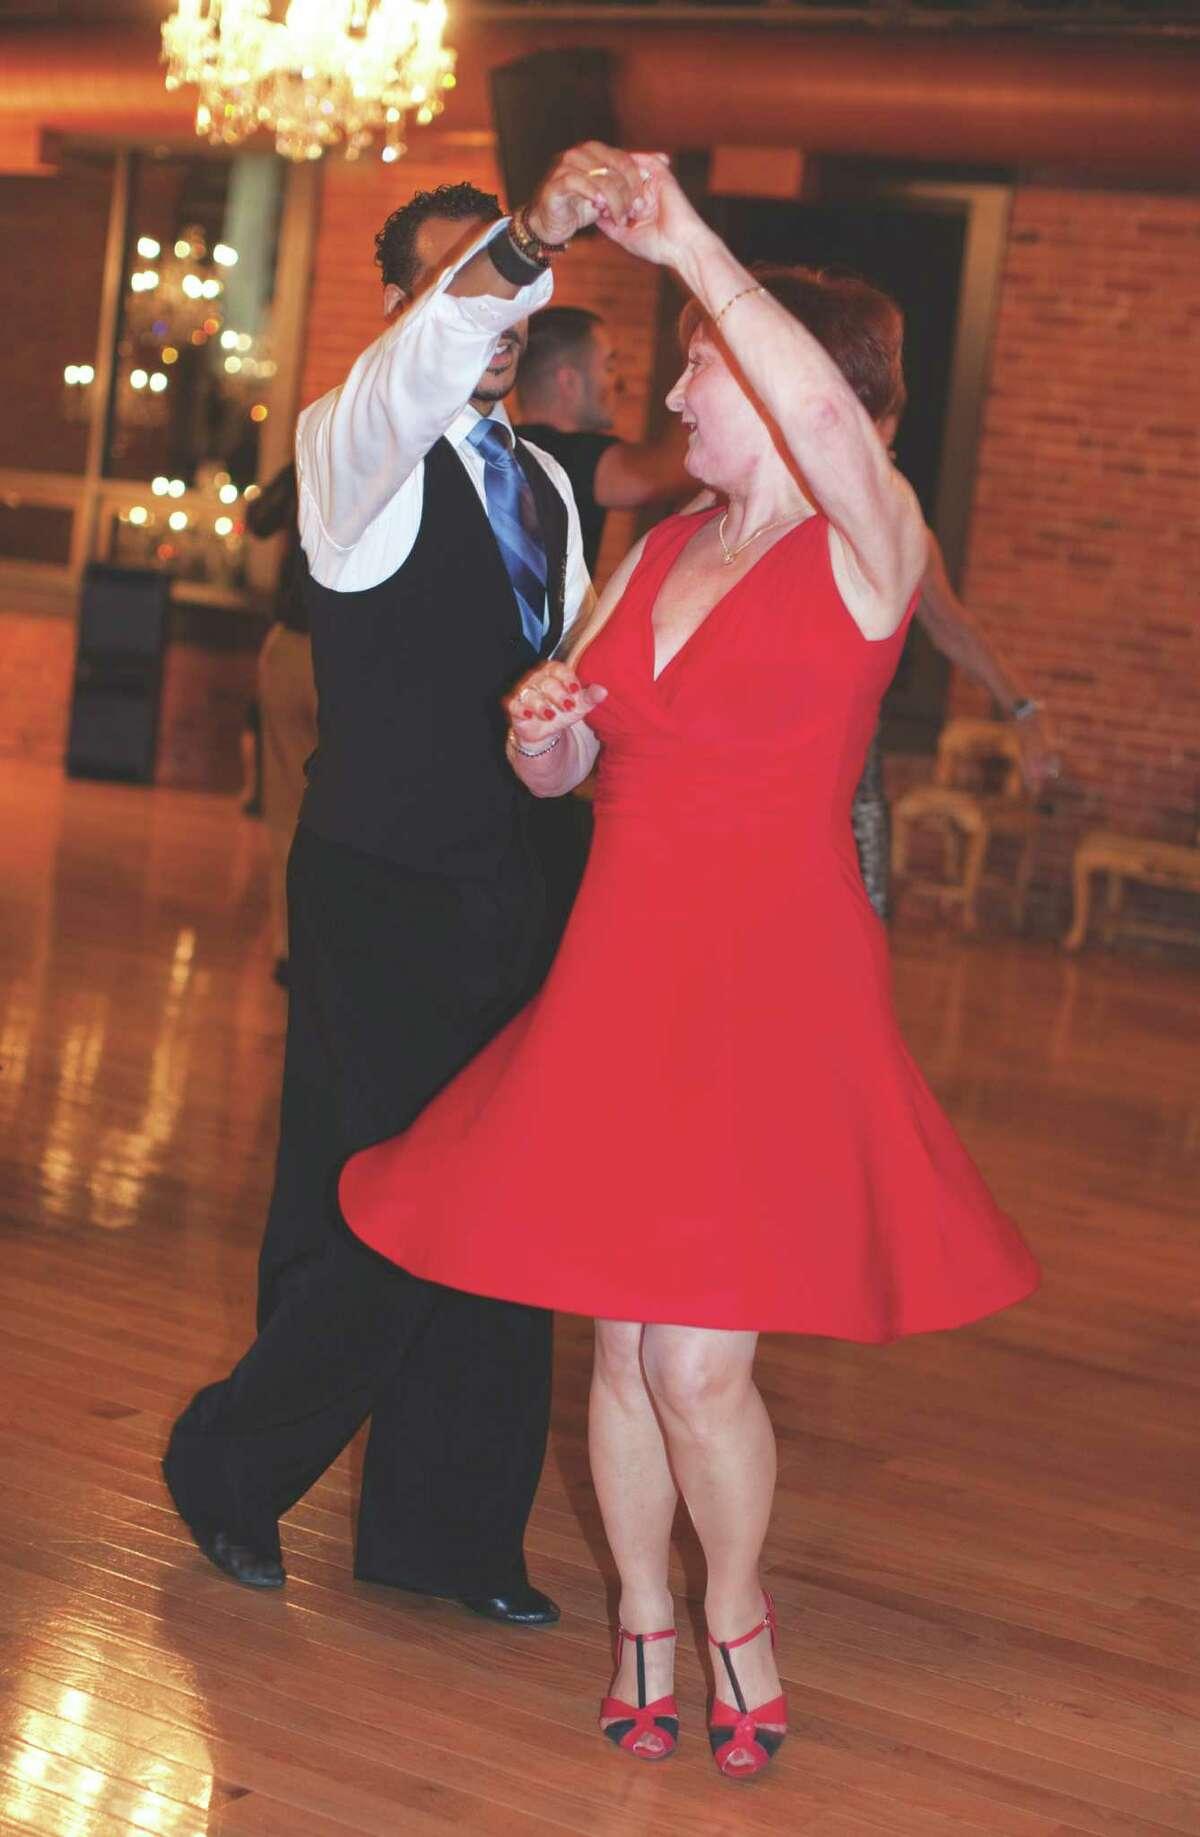 Instructor Edwardo Rojas dances with Agi Hale during a post-lesson dance party.